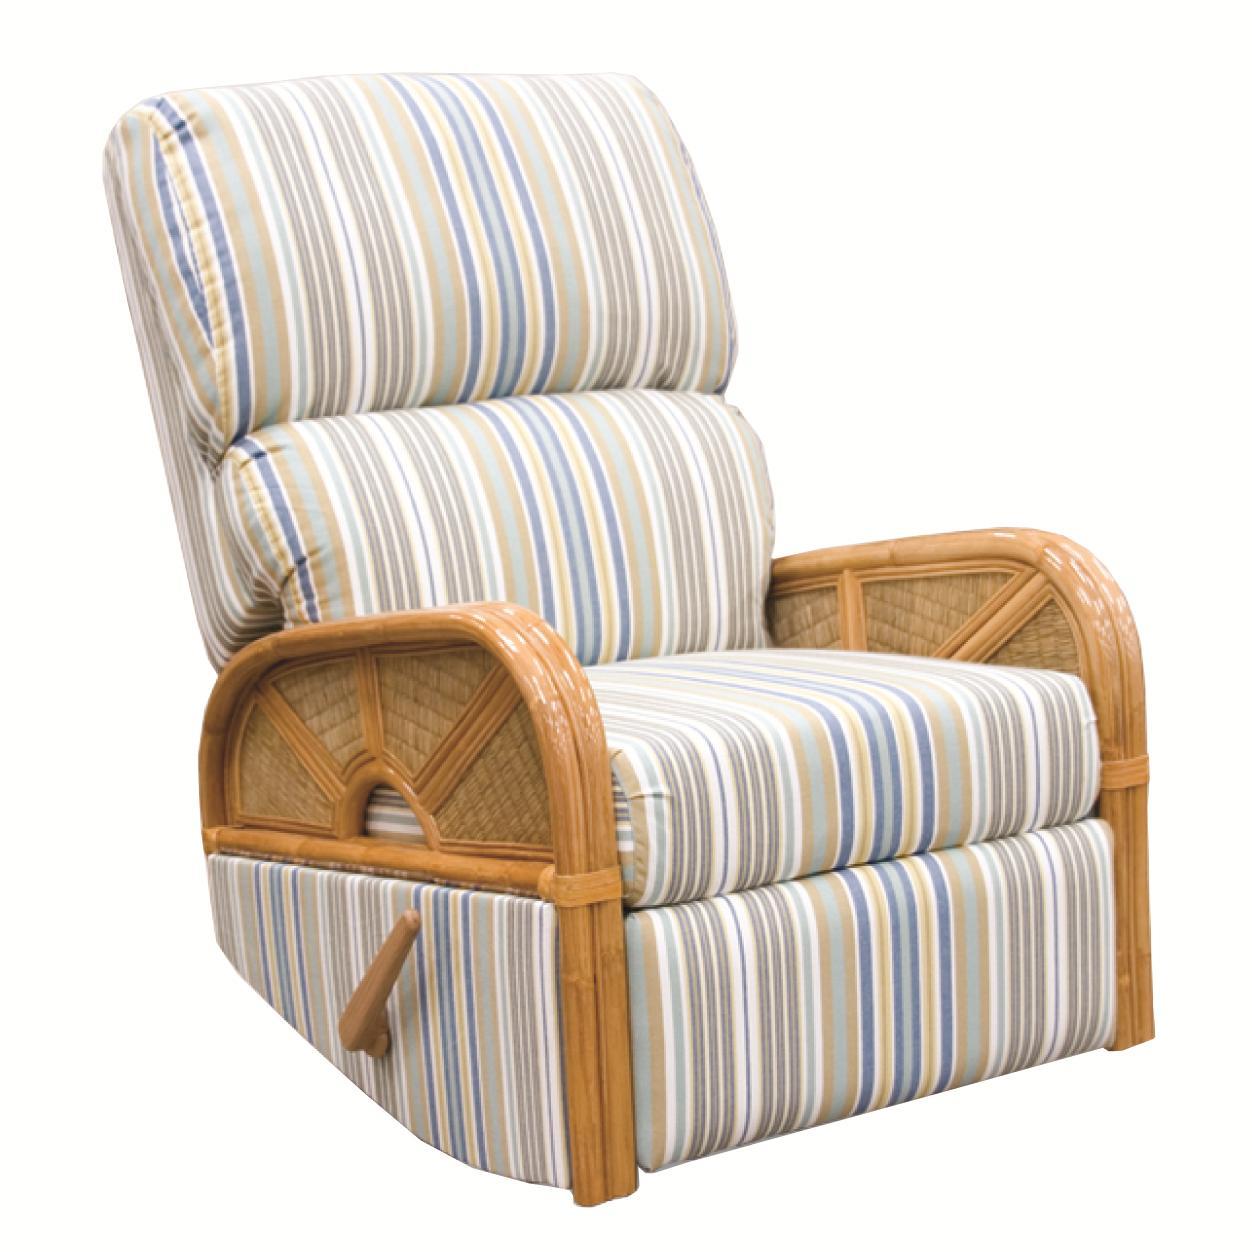 capris furniture 381 collection wicker rattan swivel glider recliner furniture three way recliner